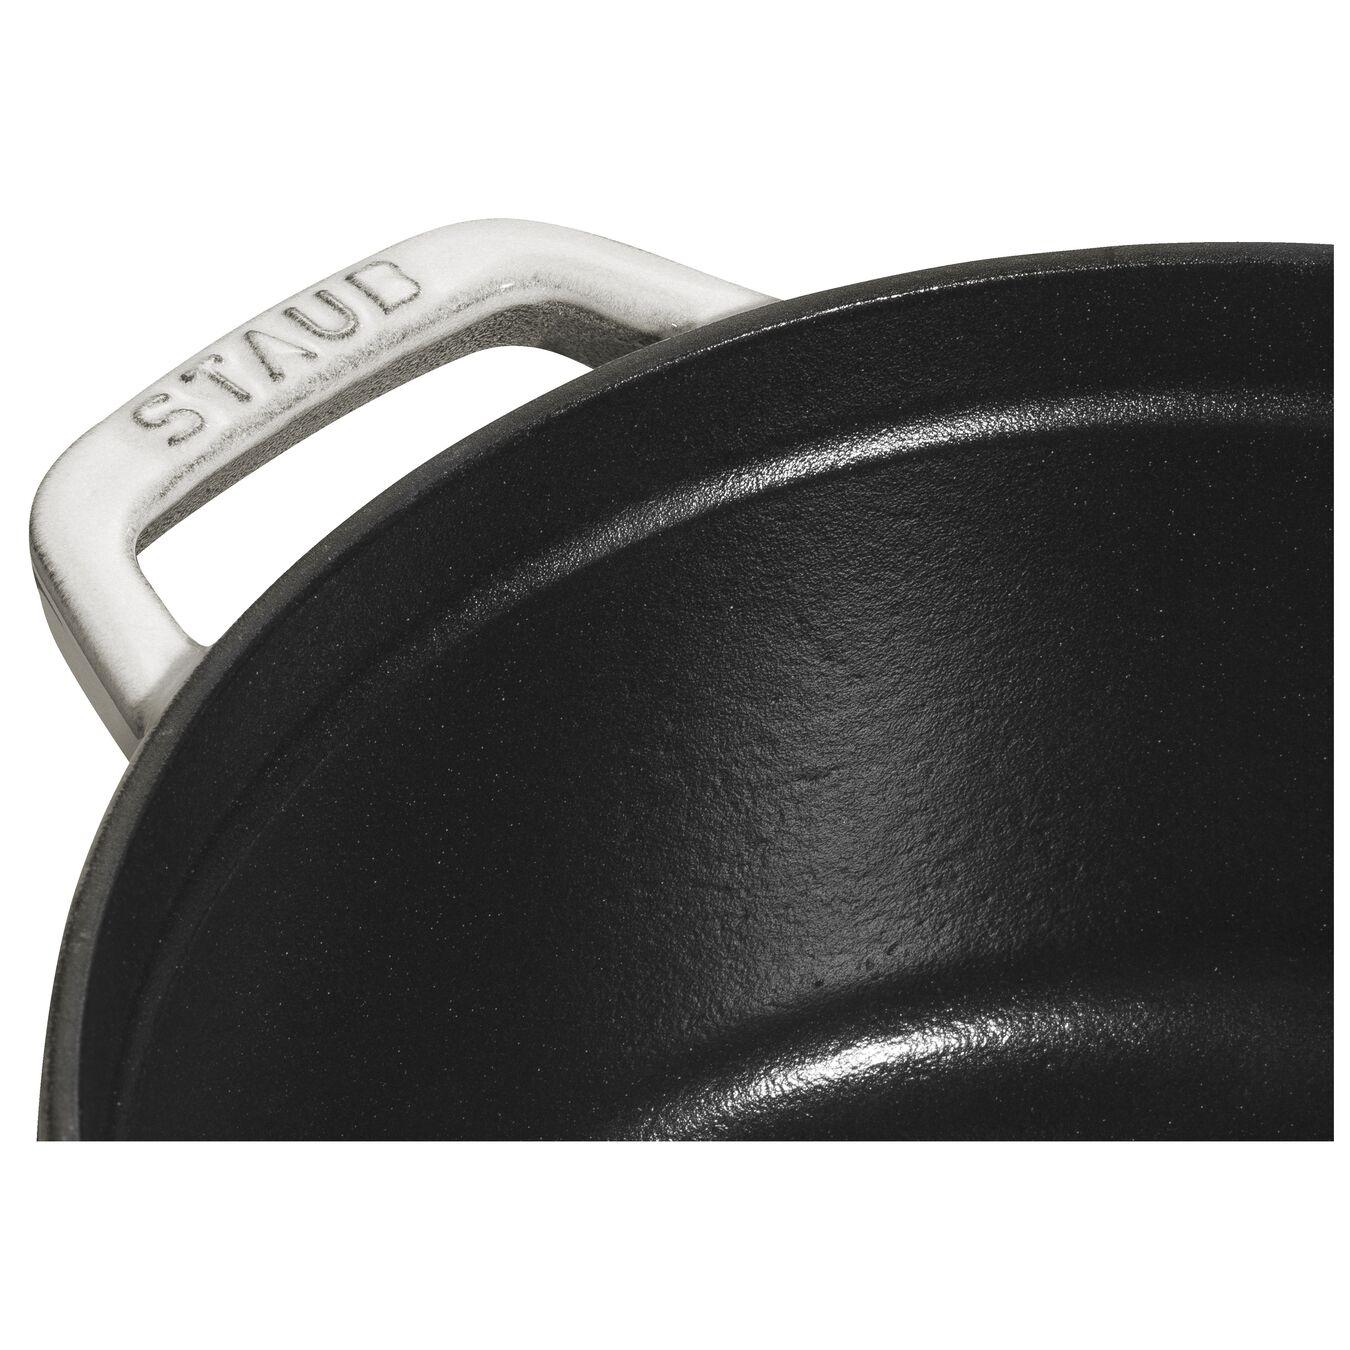 Cocotte rotonda - 22 cm, tartufo bianco,,large 4